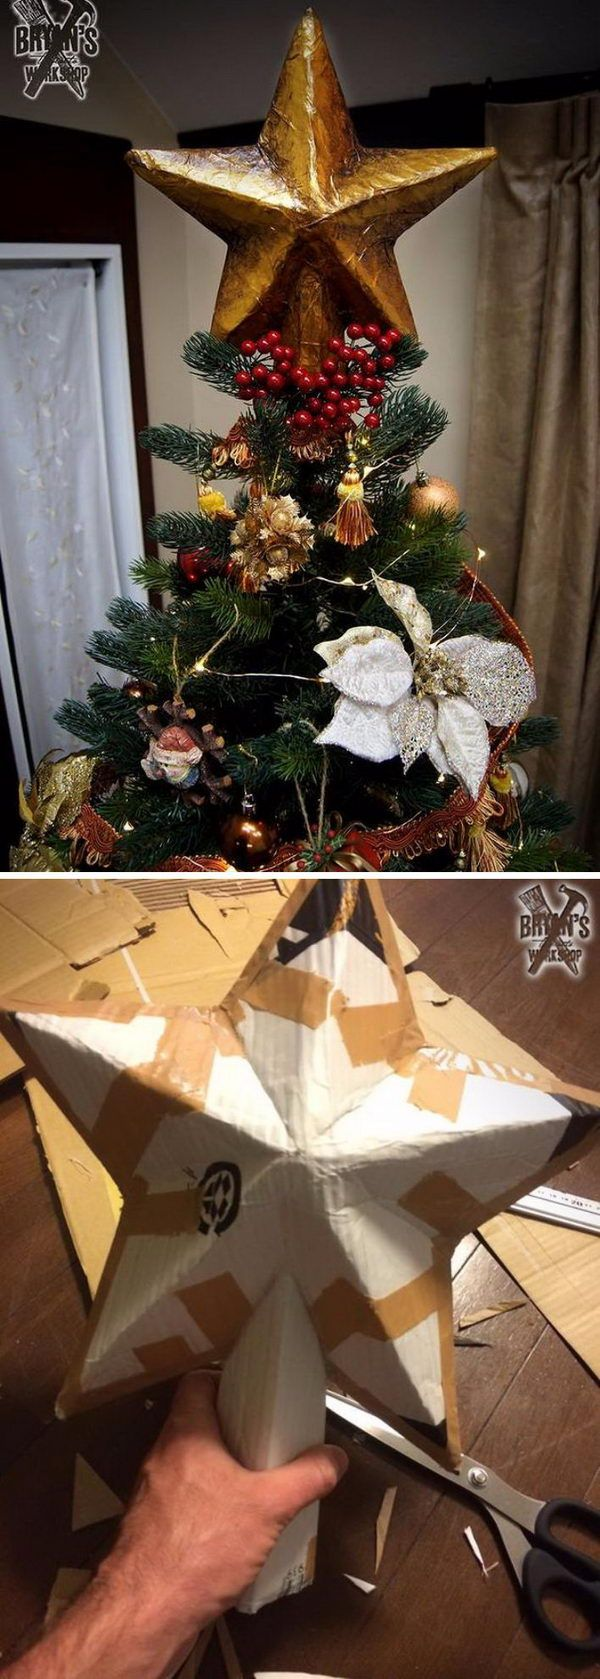 Awesome Diy Christmas Tree Topper Ideas Tutorials 2017 Diy Christmas Tree Topper Diy Tree Topper Diy Christmas Tree